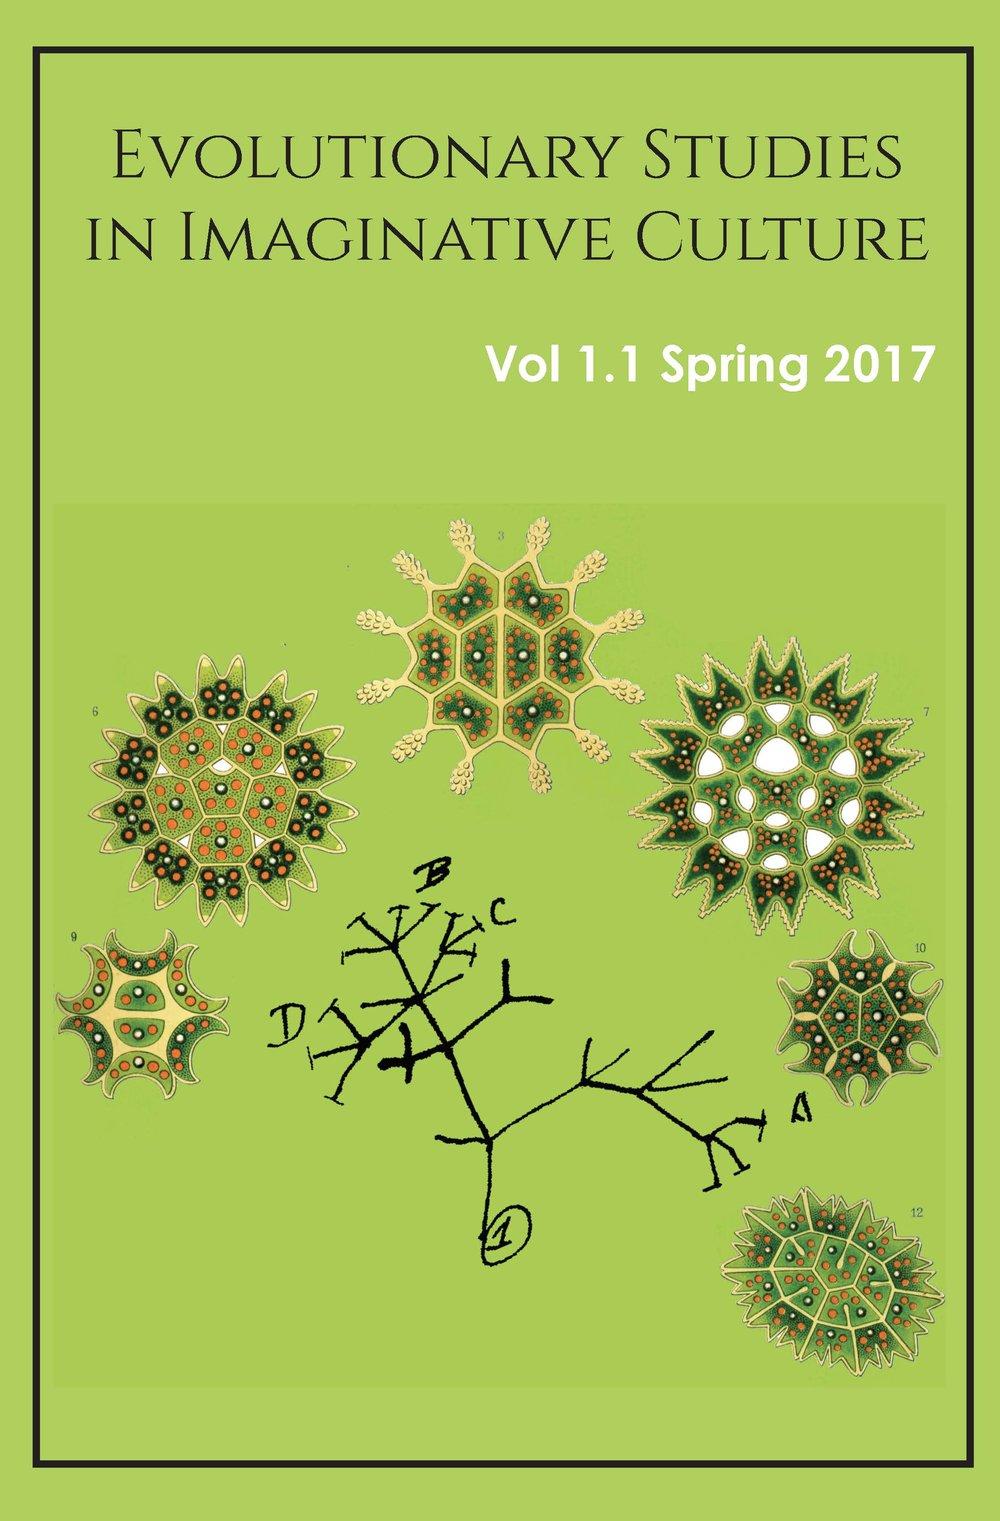 ESIC Cover 1.jpg